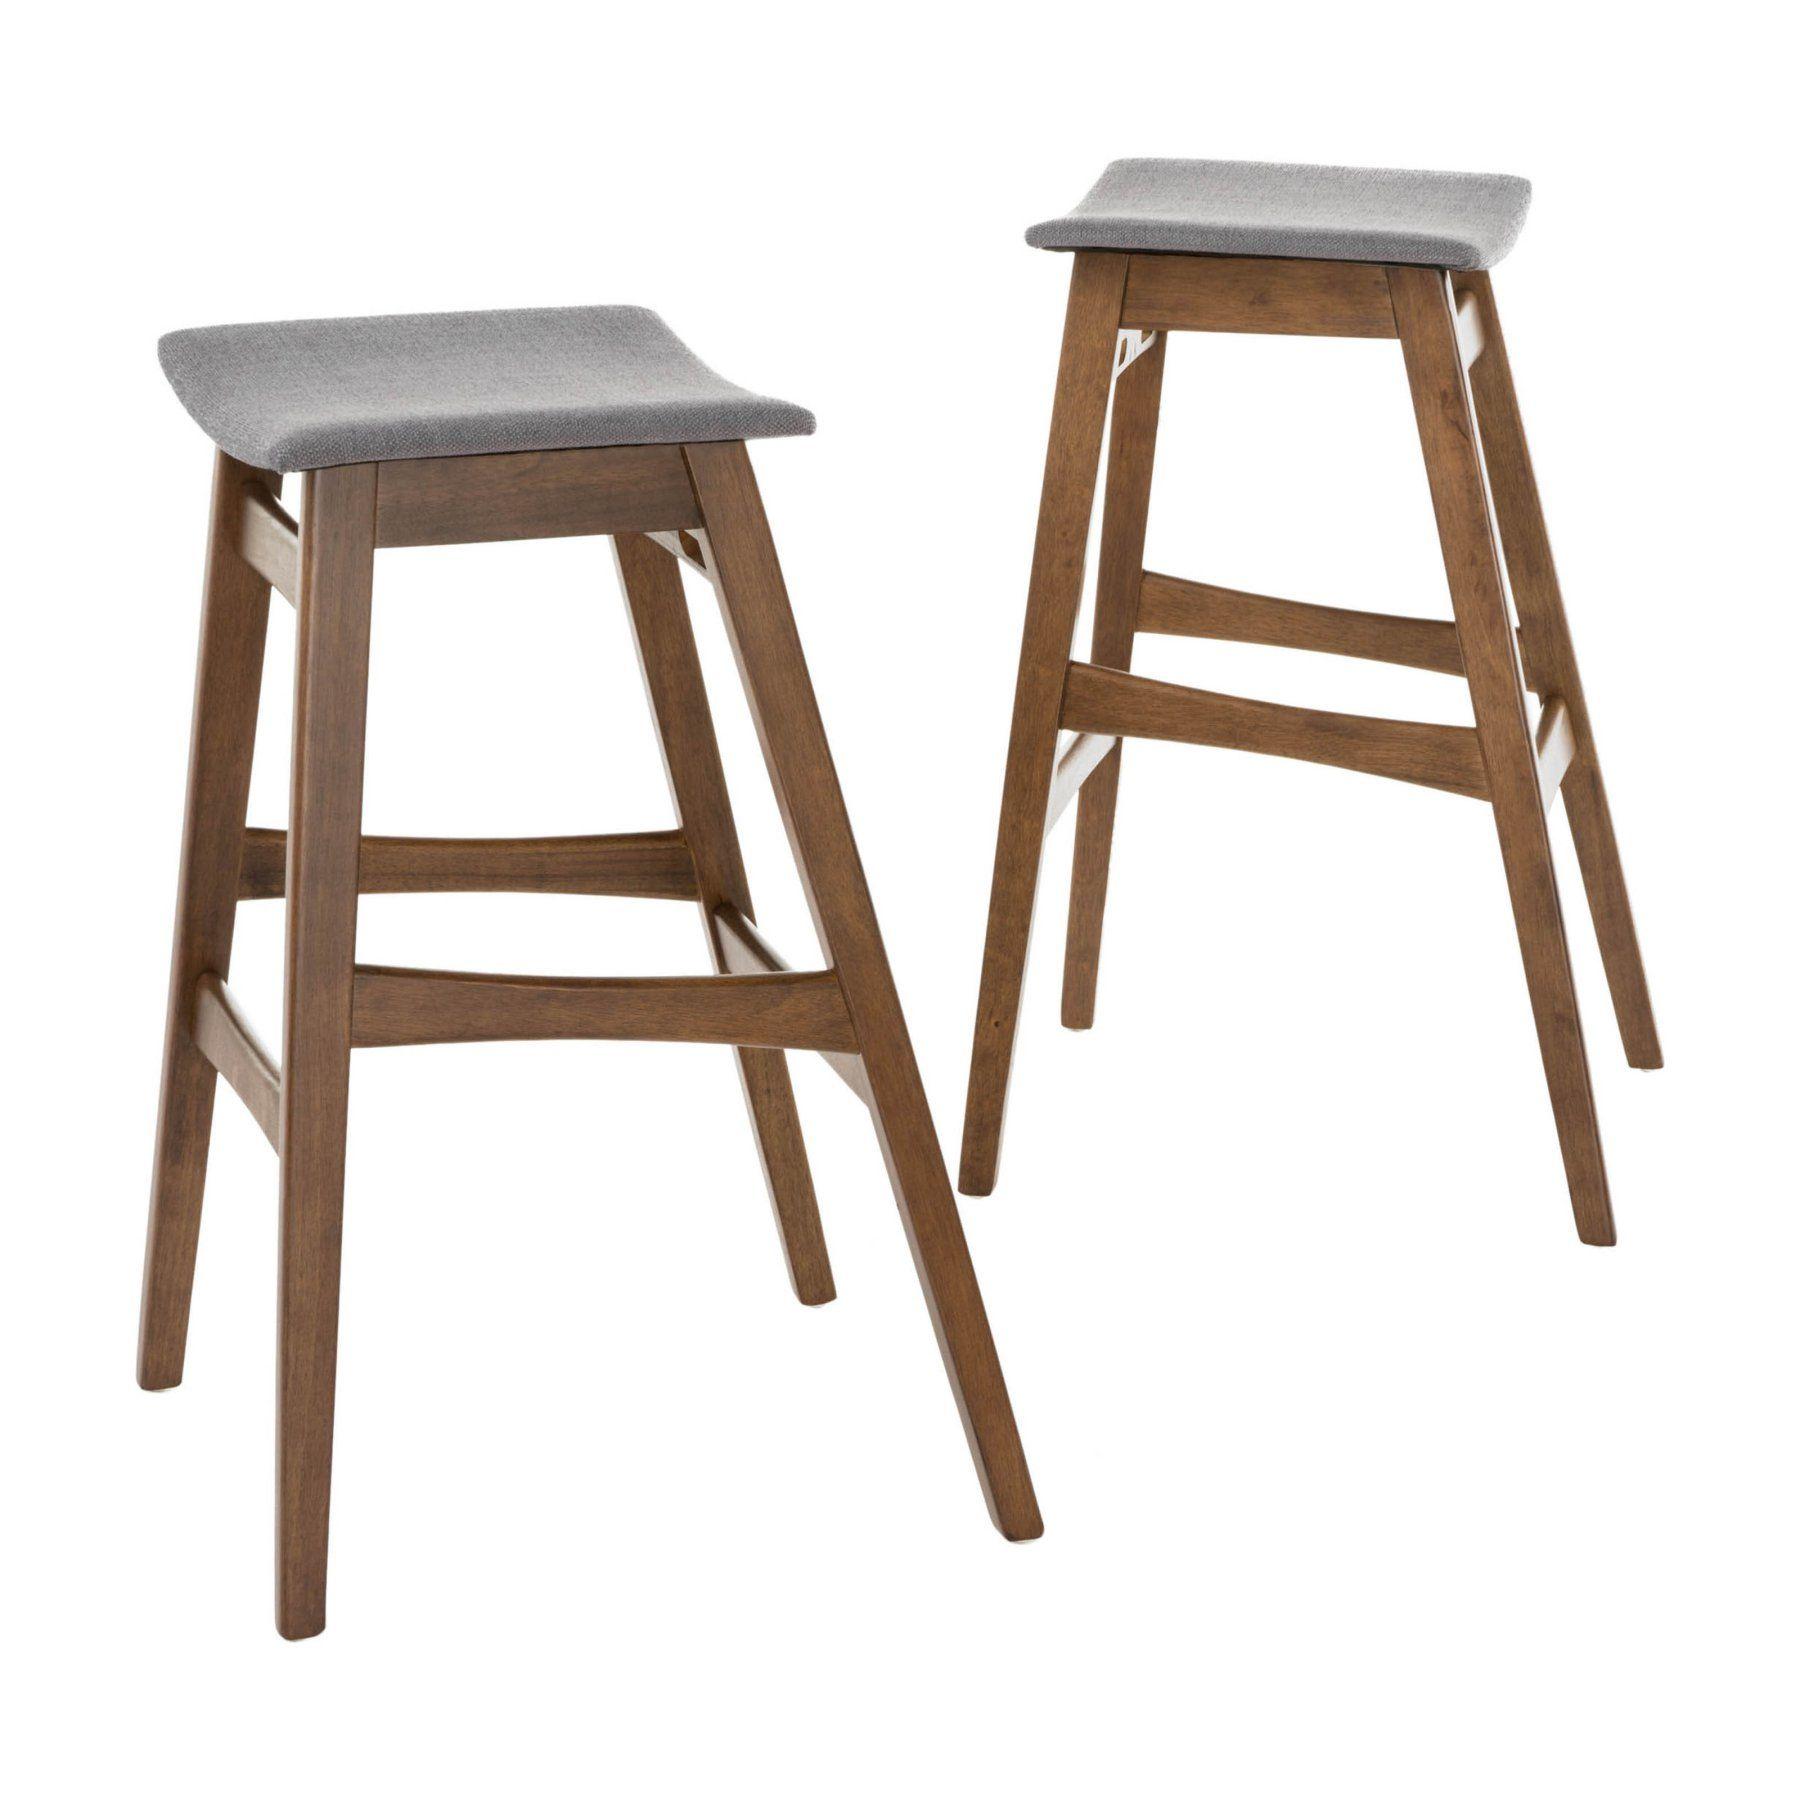 Fine Emmaline 30 In Backless Saddle Seat Bar Stool Set Of 2 Inzonedesignstudio Interior Chair Design Inzonedesignstudiocom